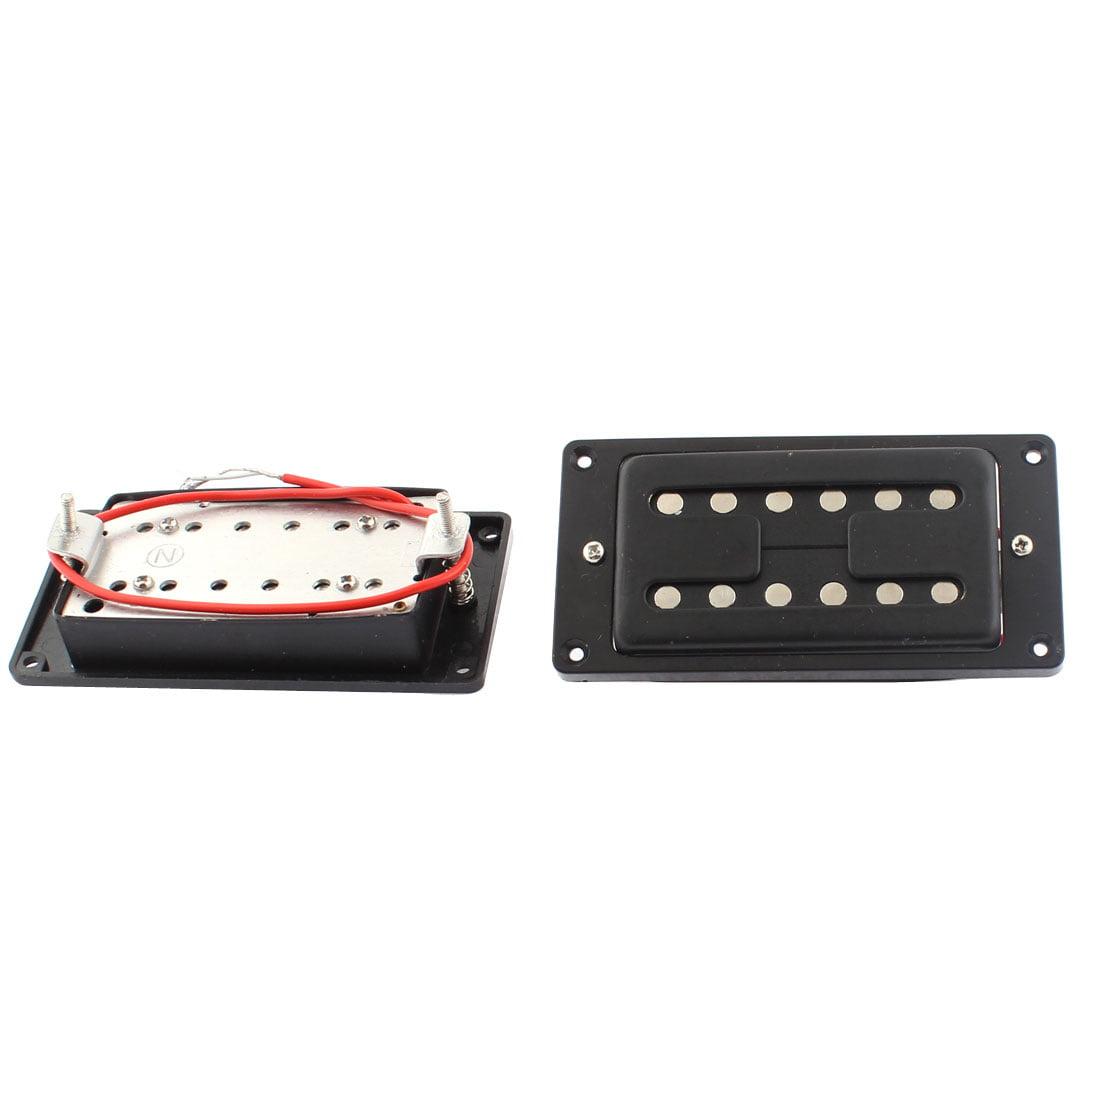 Electric Guitar LP Style Neck Bridge Double Row Humbucker Pickup Black 2pcs by